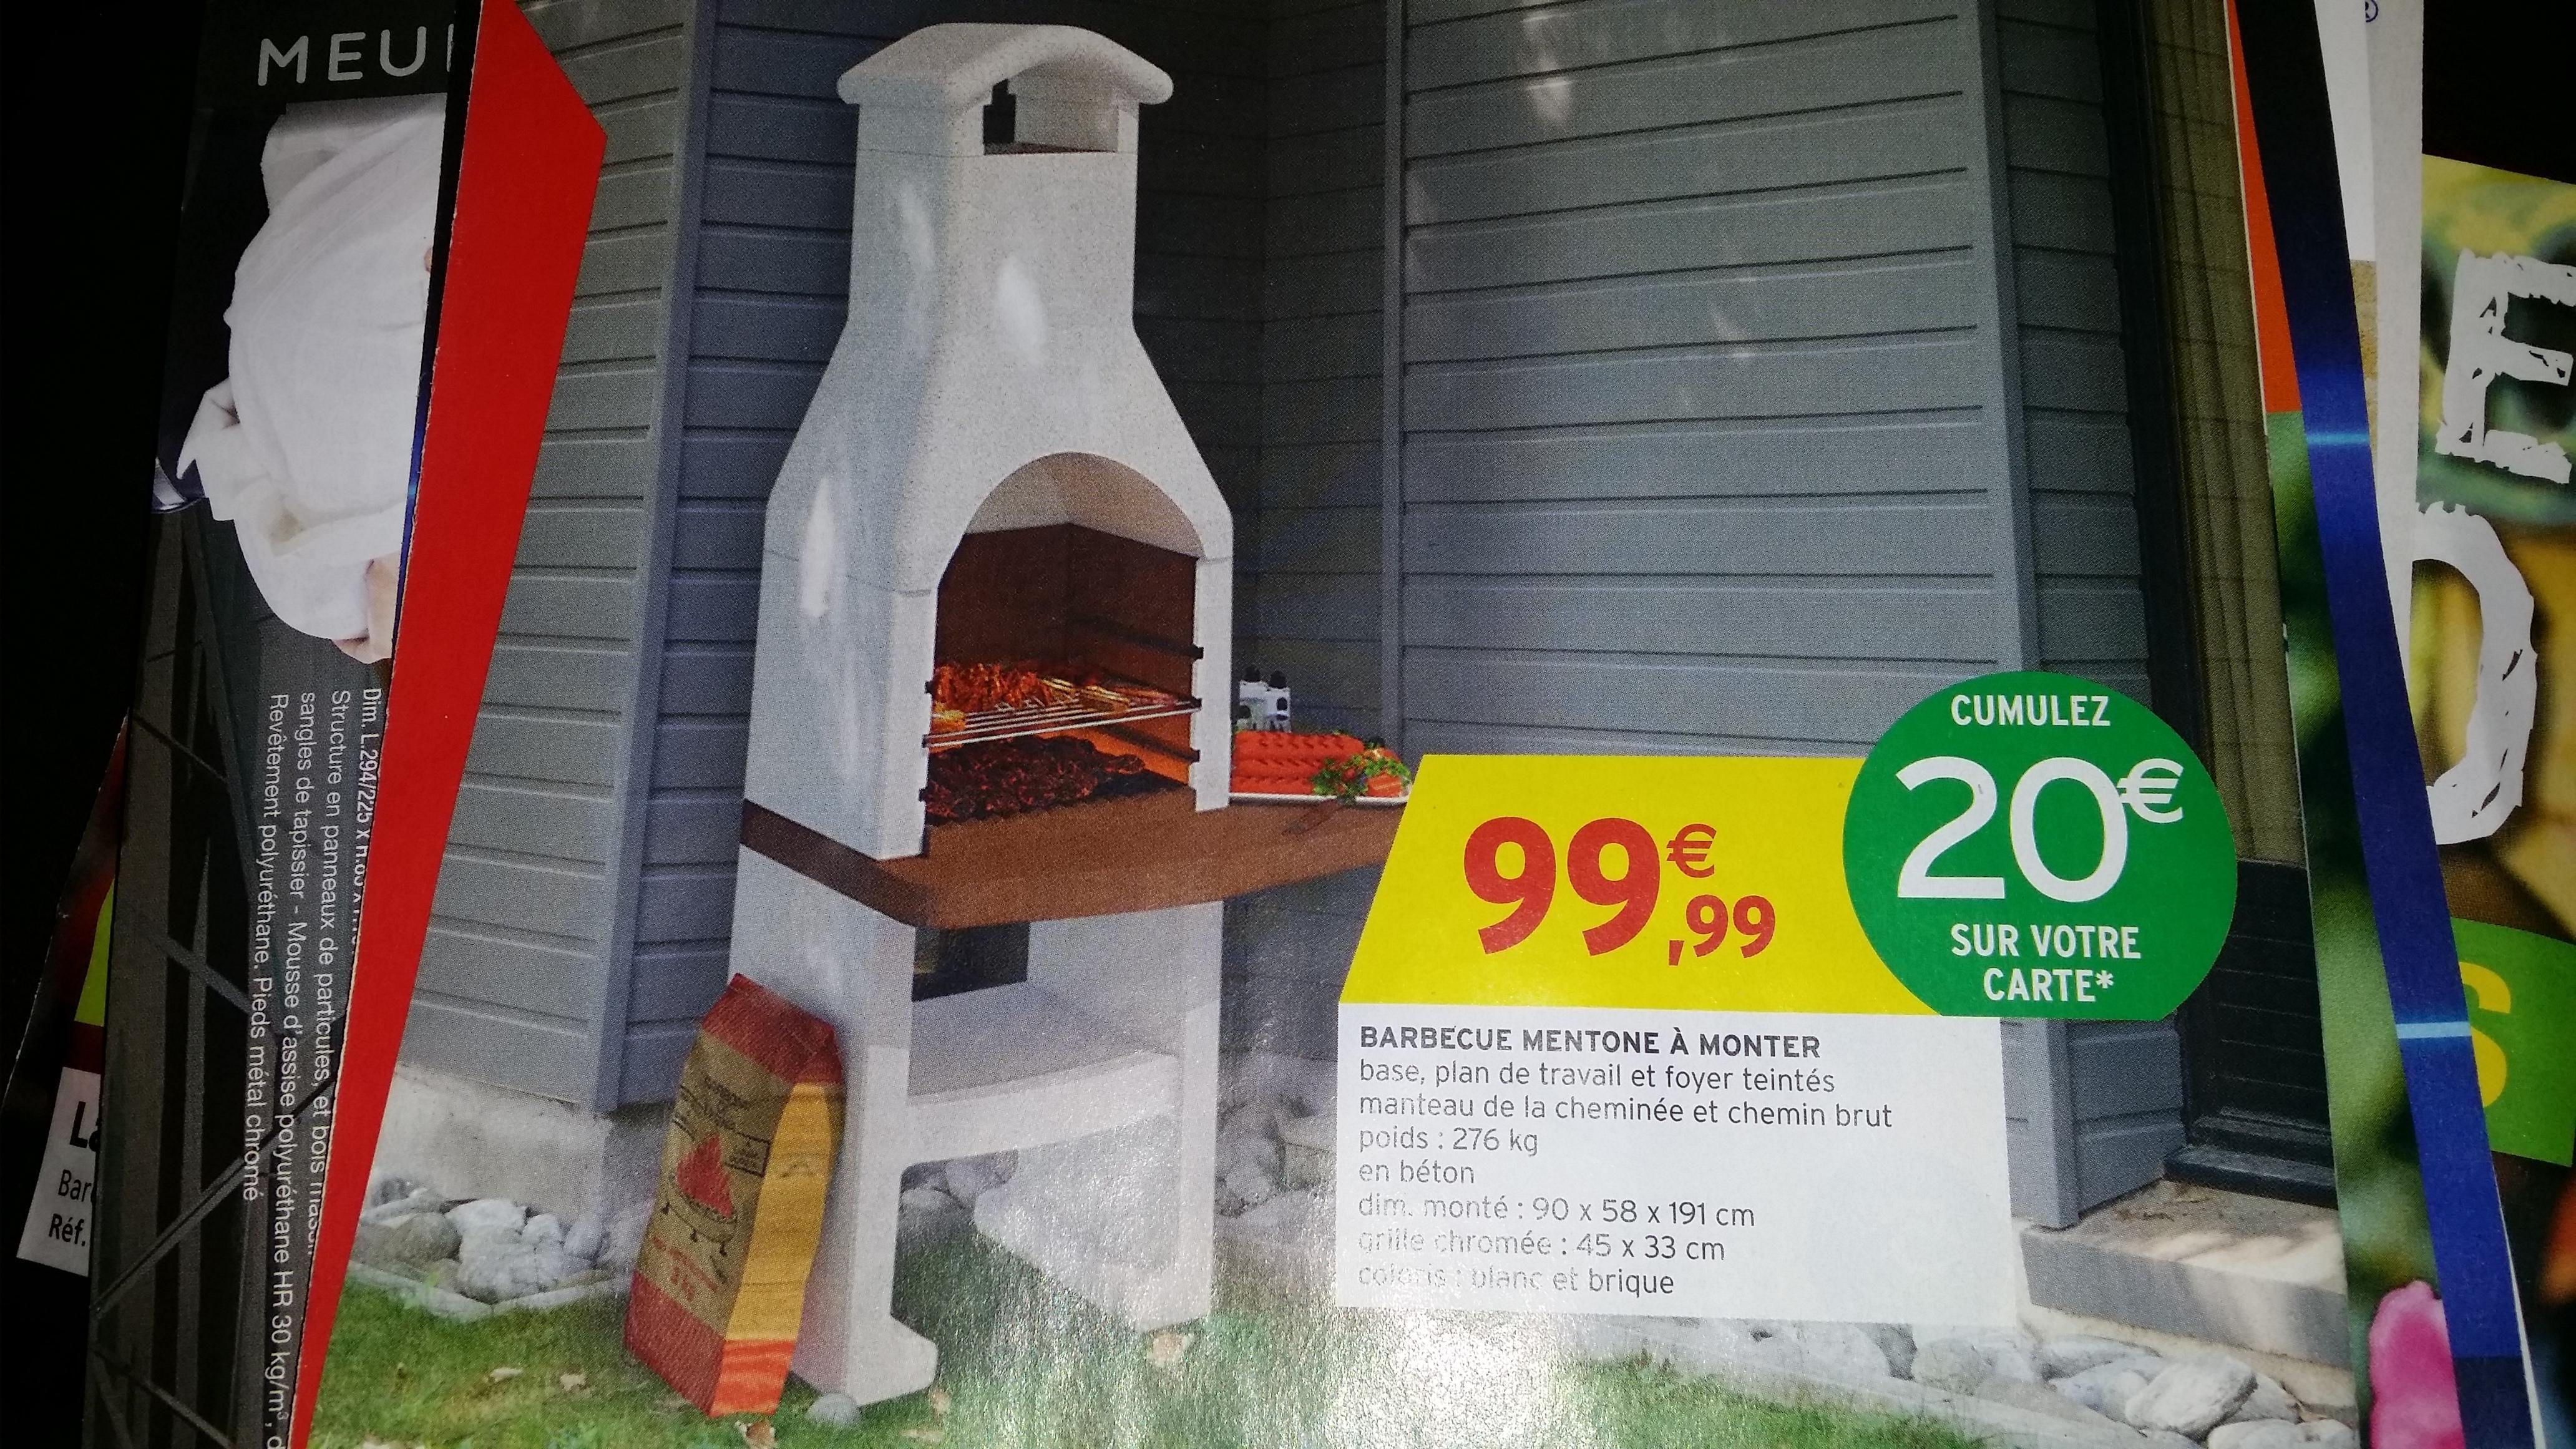 barbecue mentone monter avec 20 sur la carte. Black Bedroom Furniture Sets. Home Design Ideas